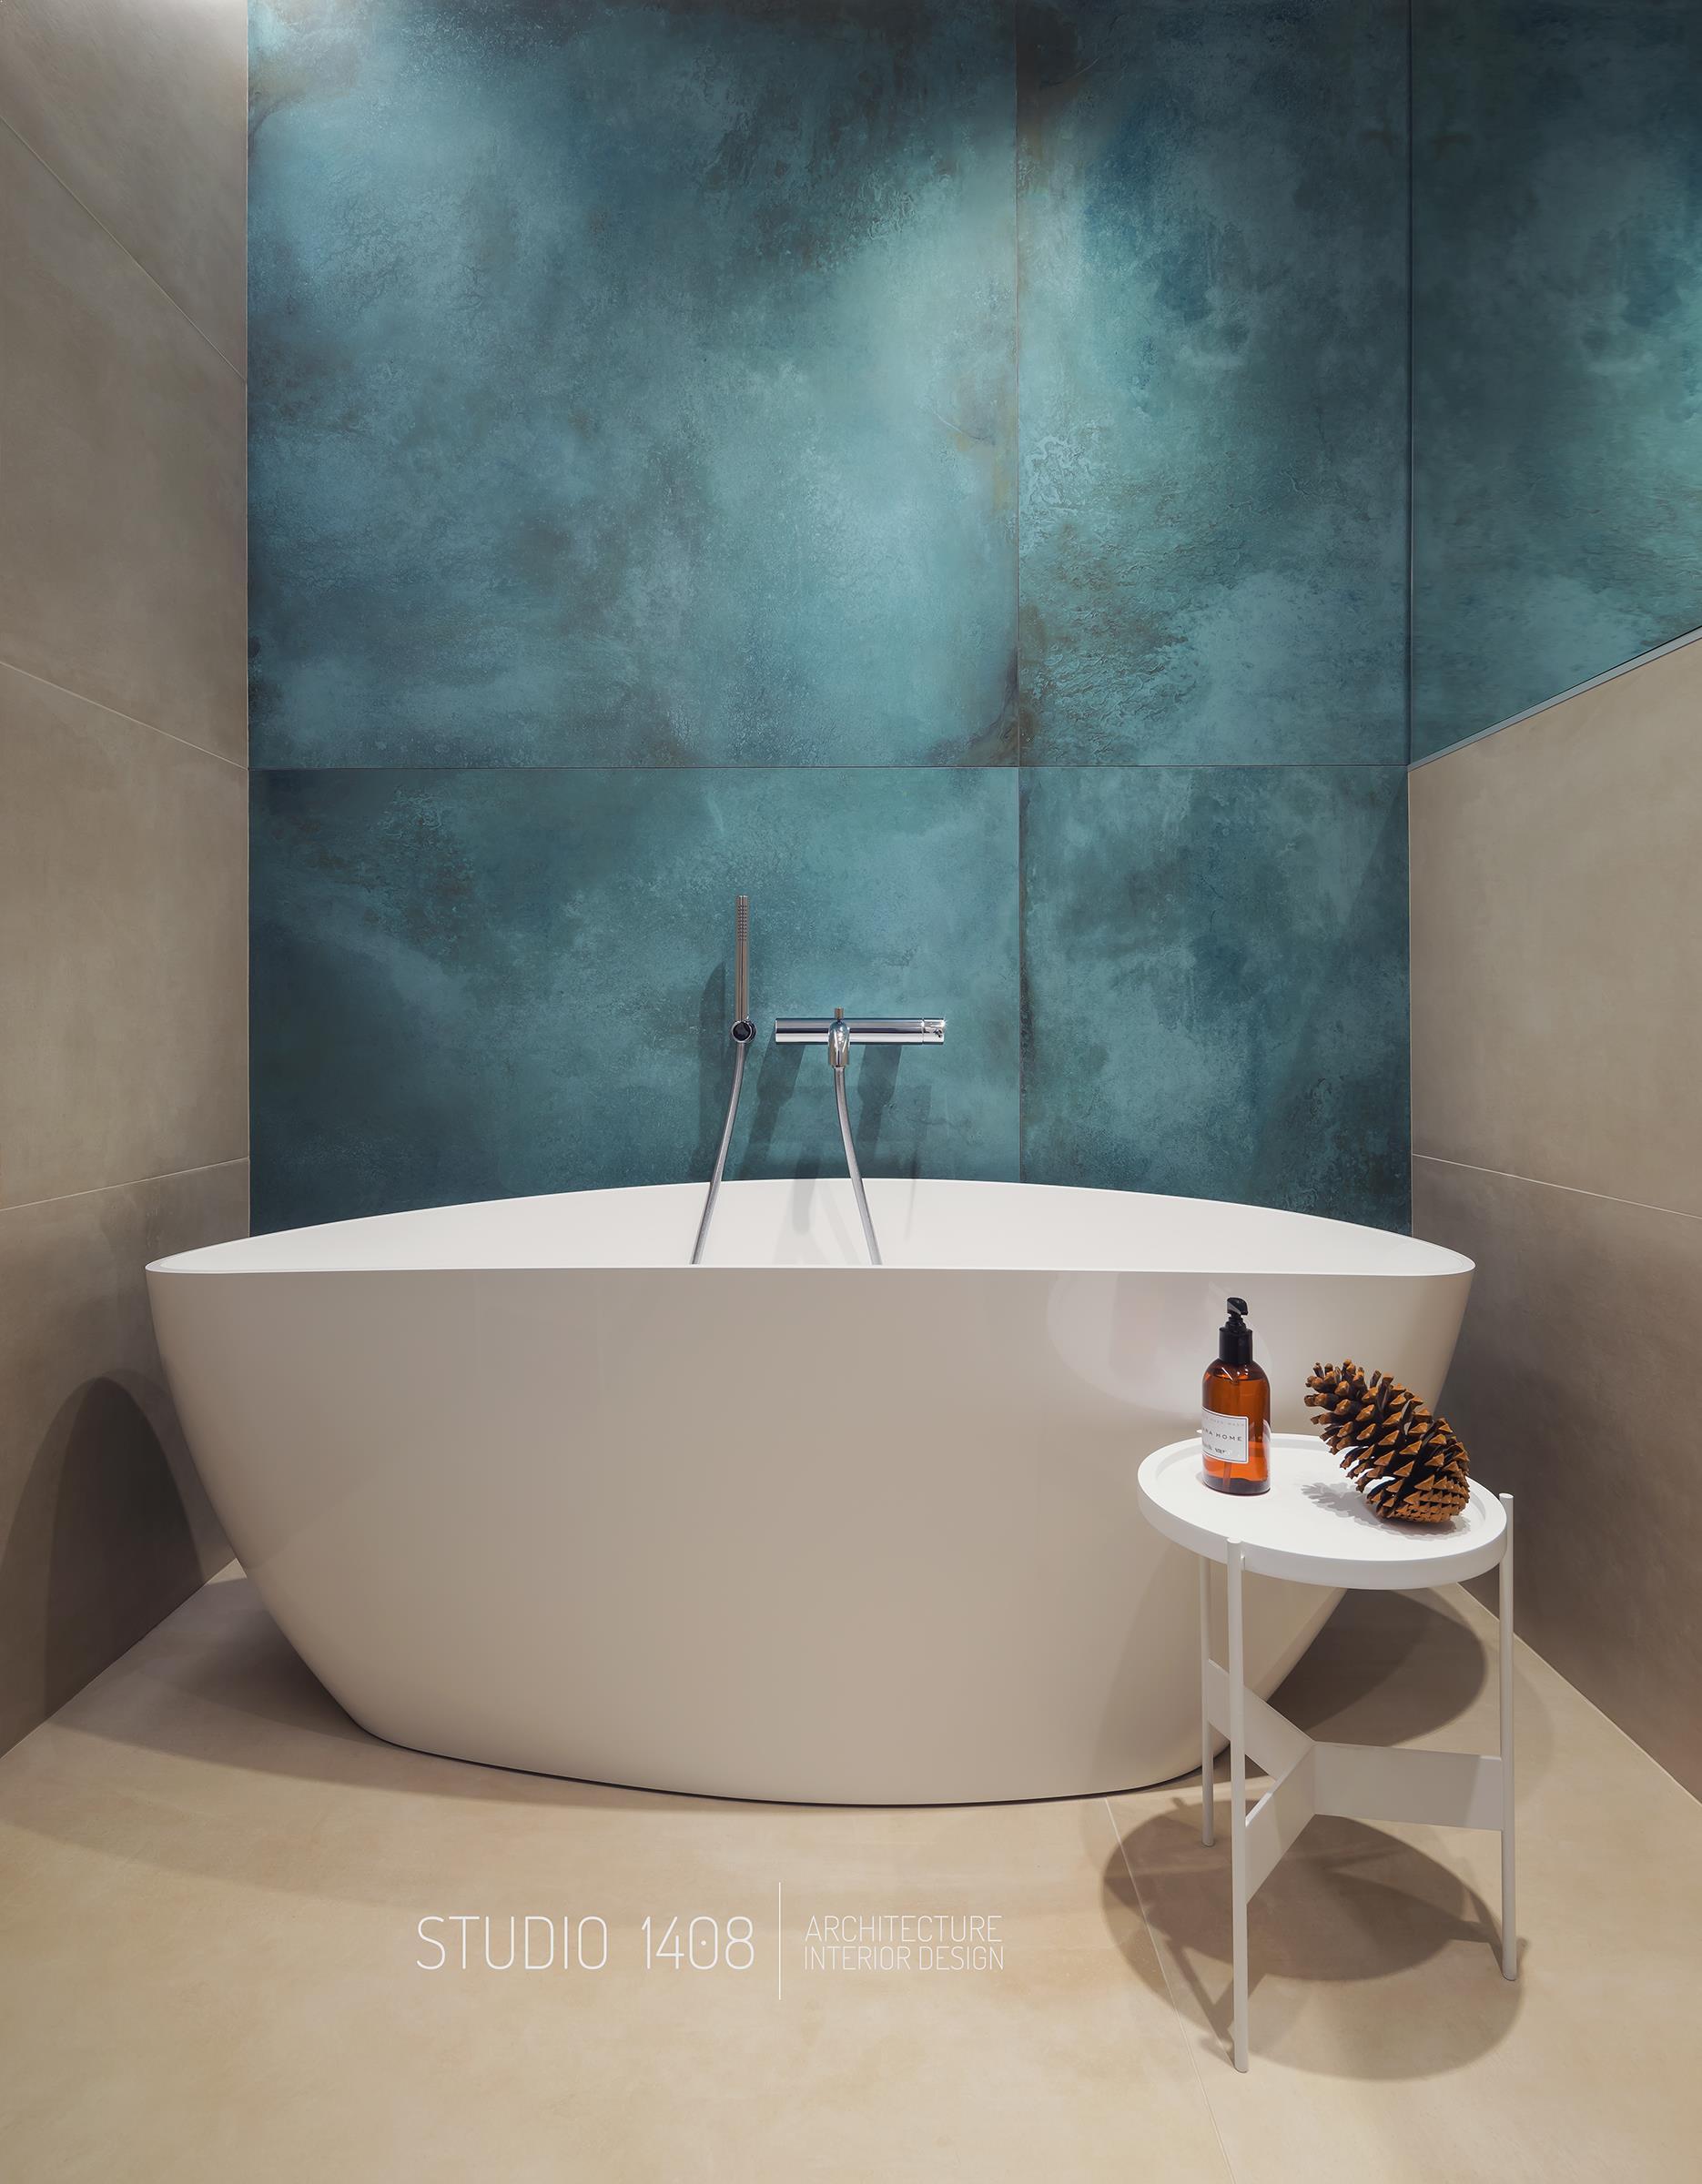 decoratiuni baie perete cada